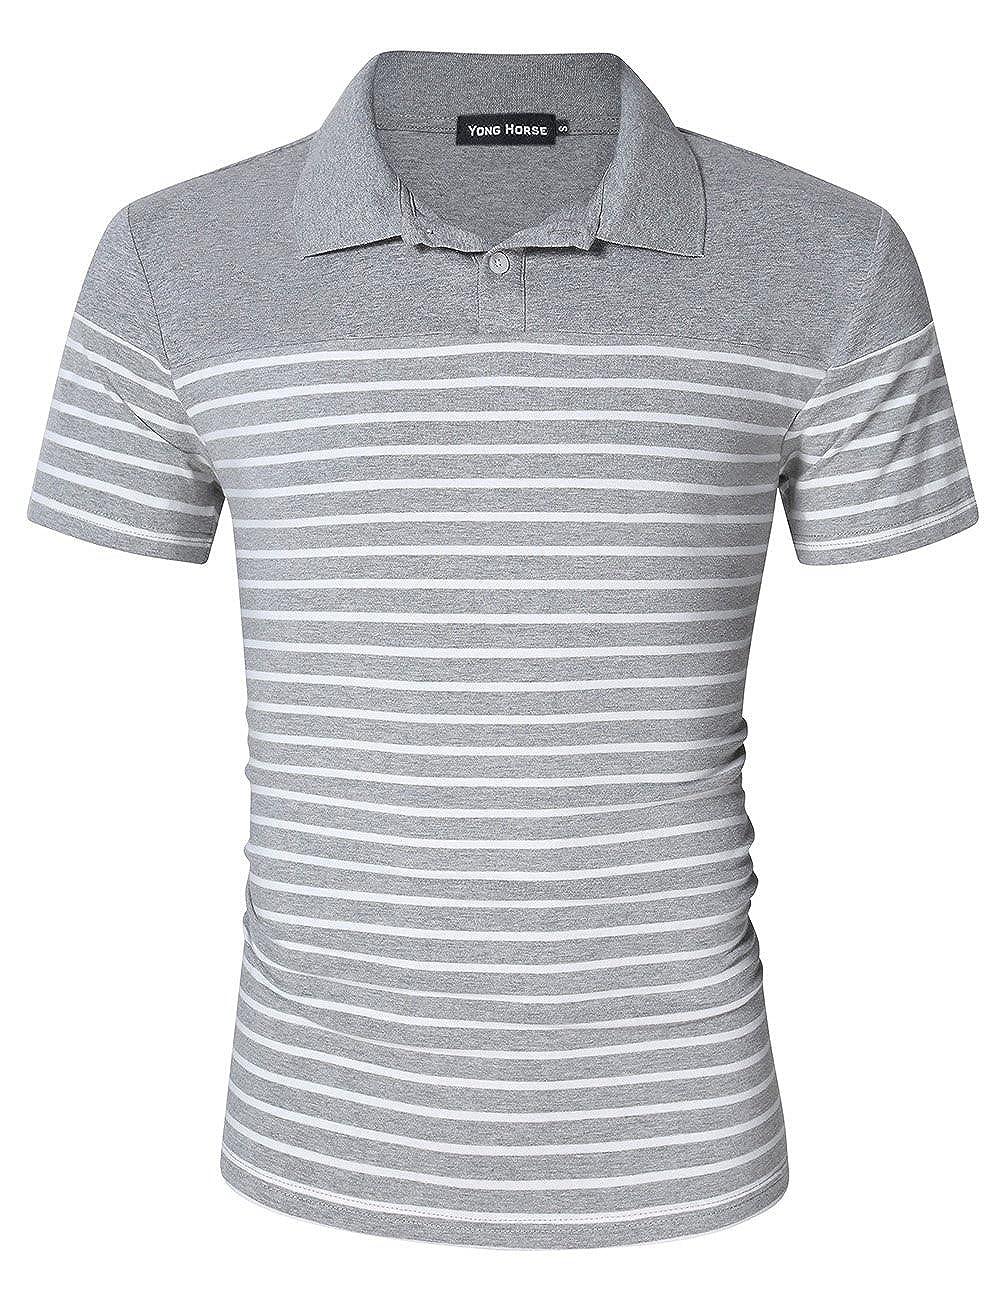 Yong Horse Mens Polo Shirts Casual Button Cotton Long//Short Sleeve T-Shirt